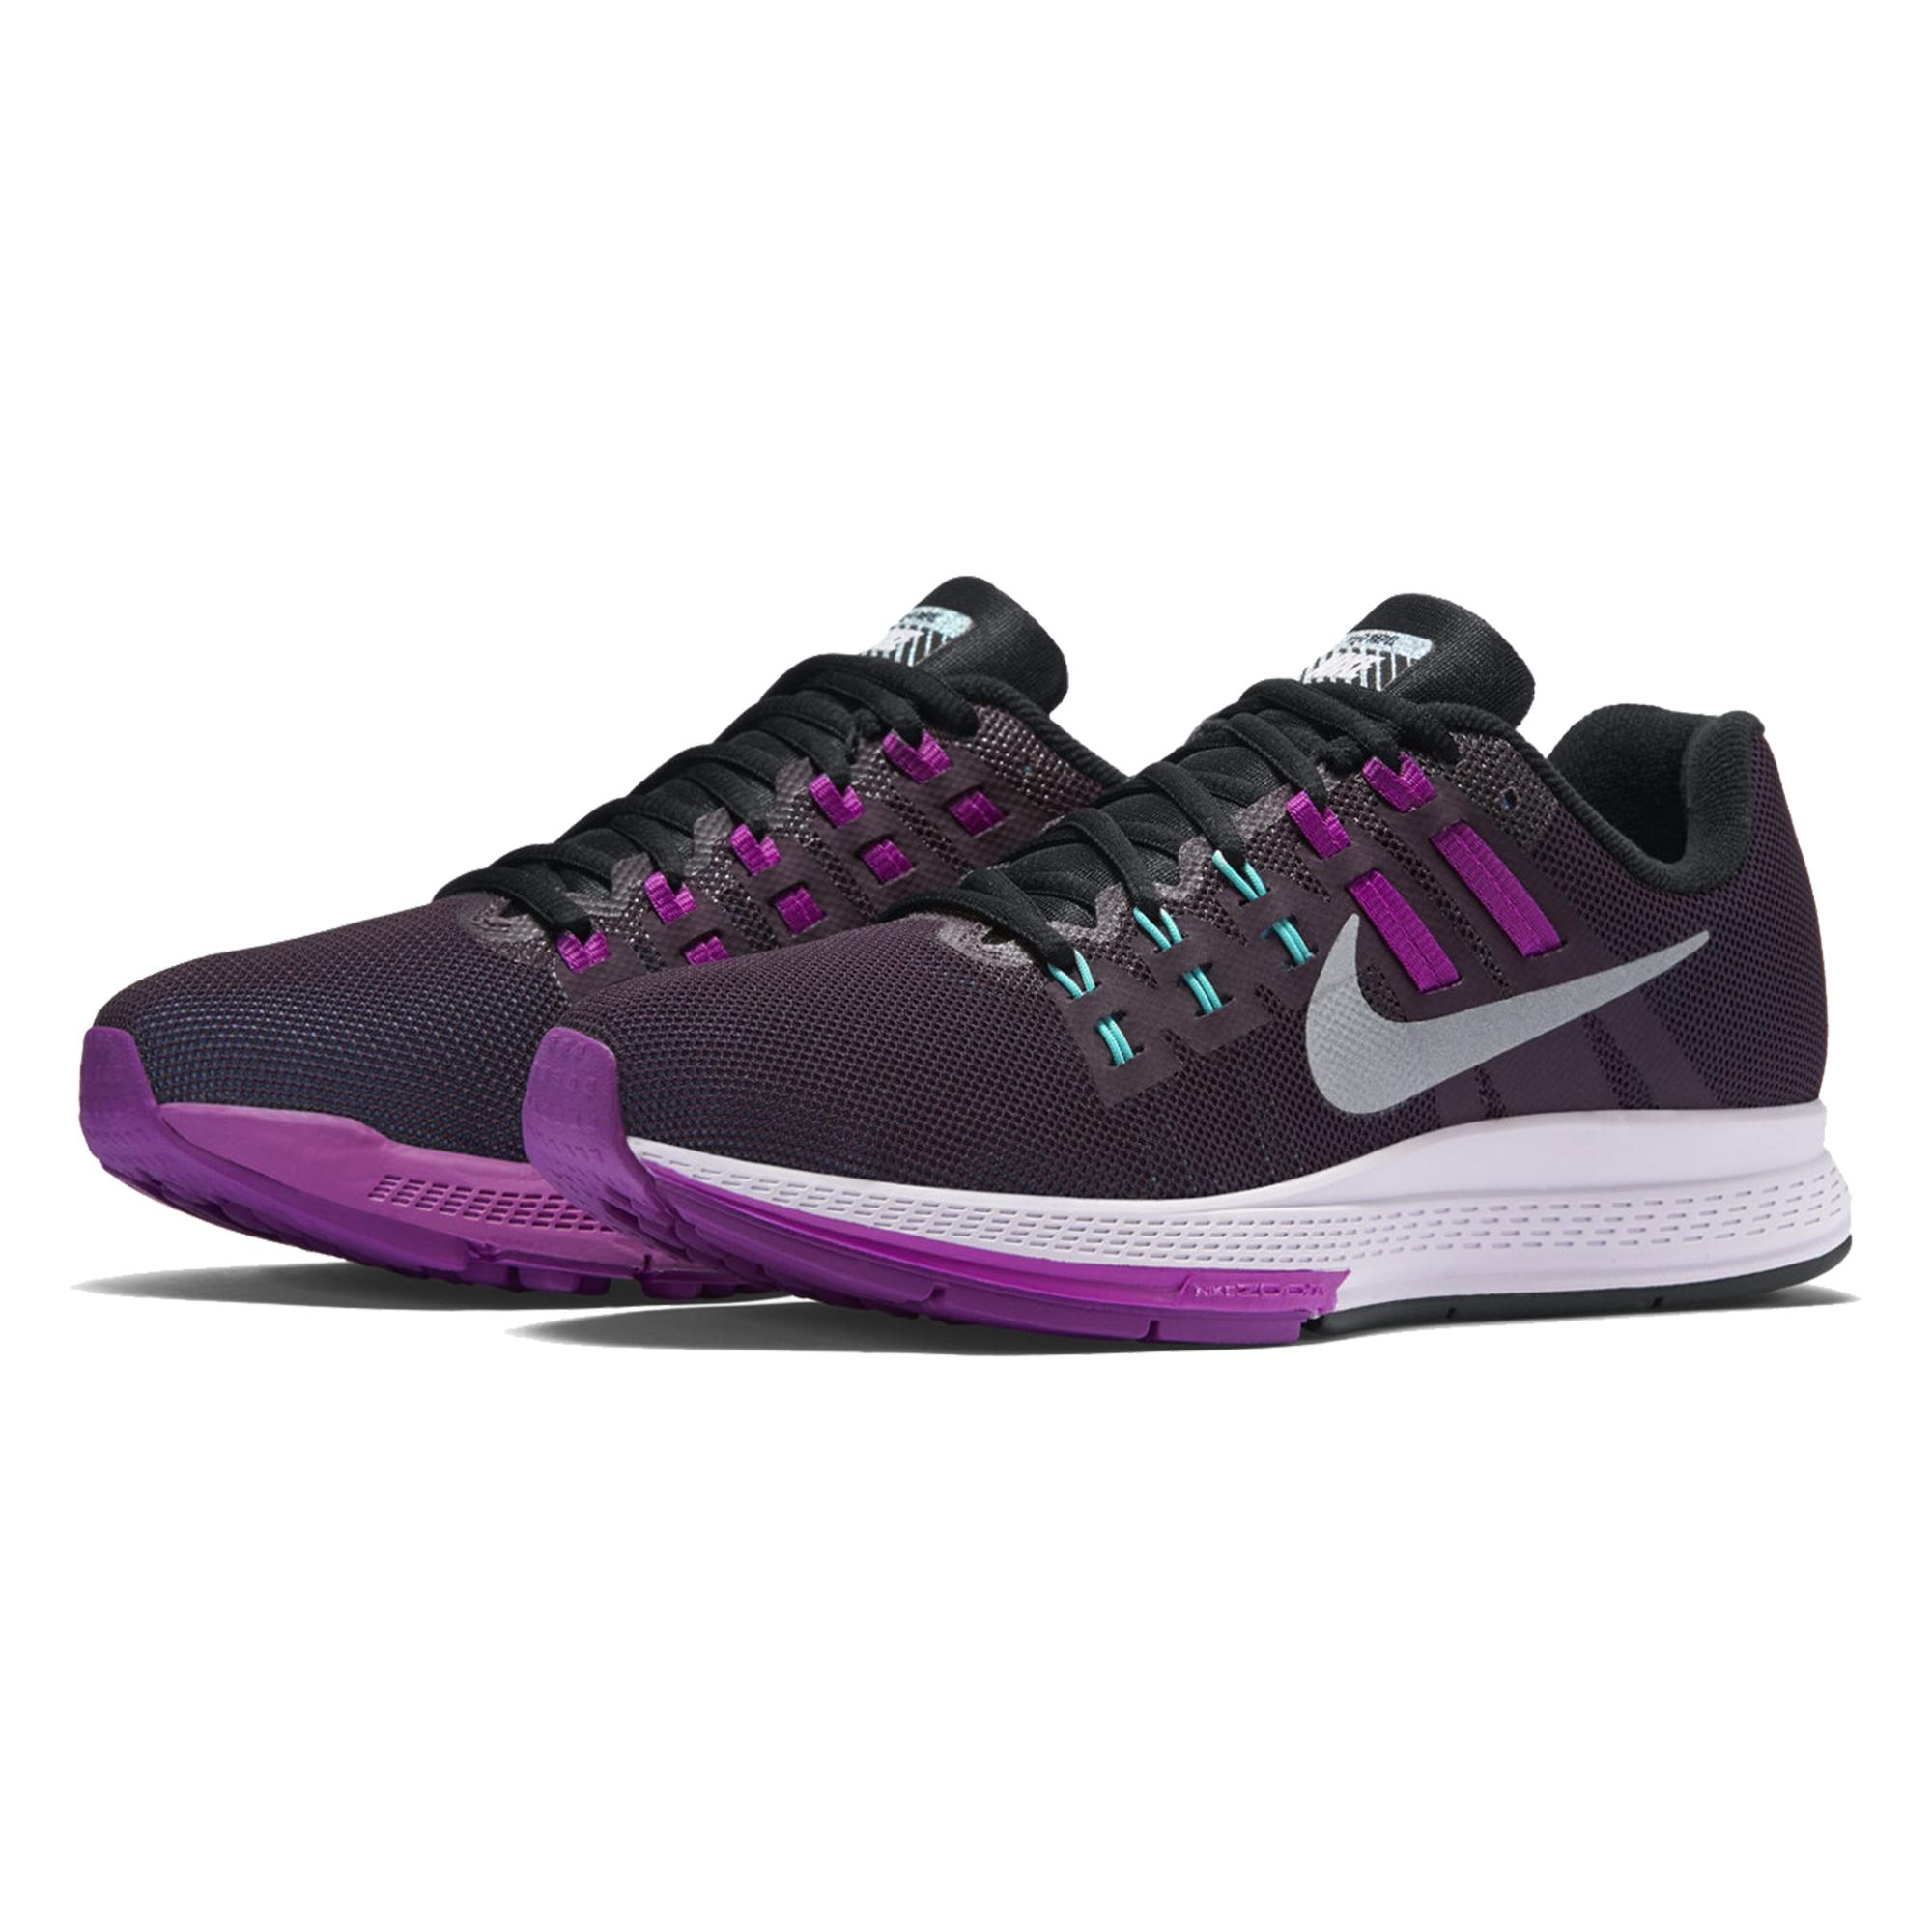 official photos 0ade3 9a883 Nike Air Zoom Structure 19 Flash Kadın Spor Ayakkabı